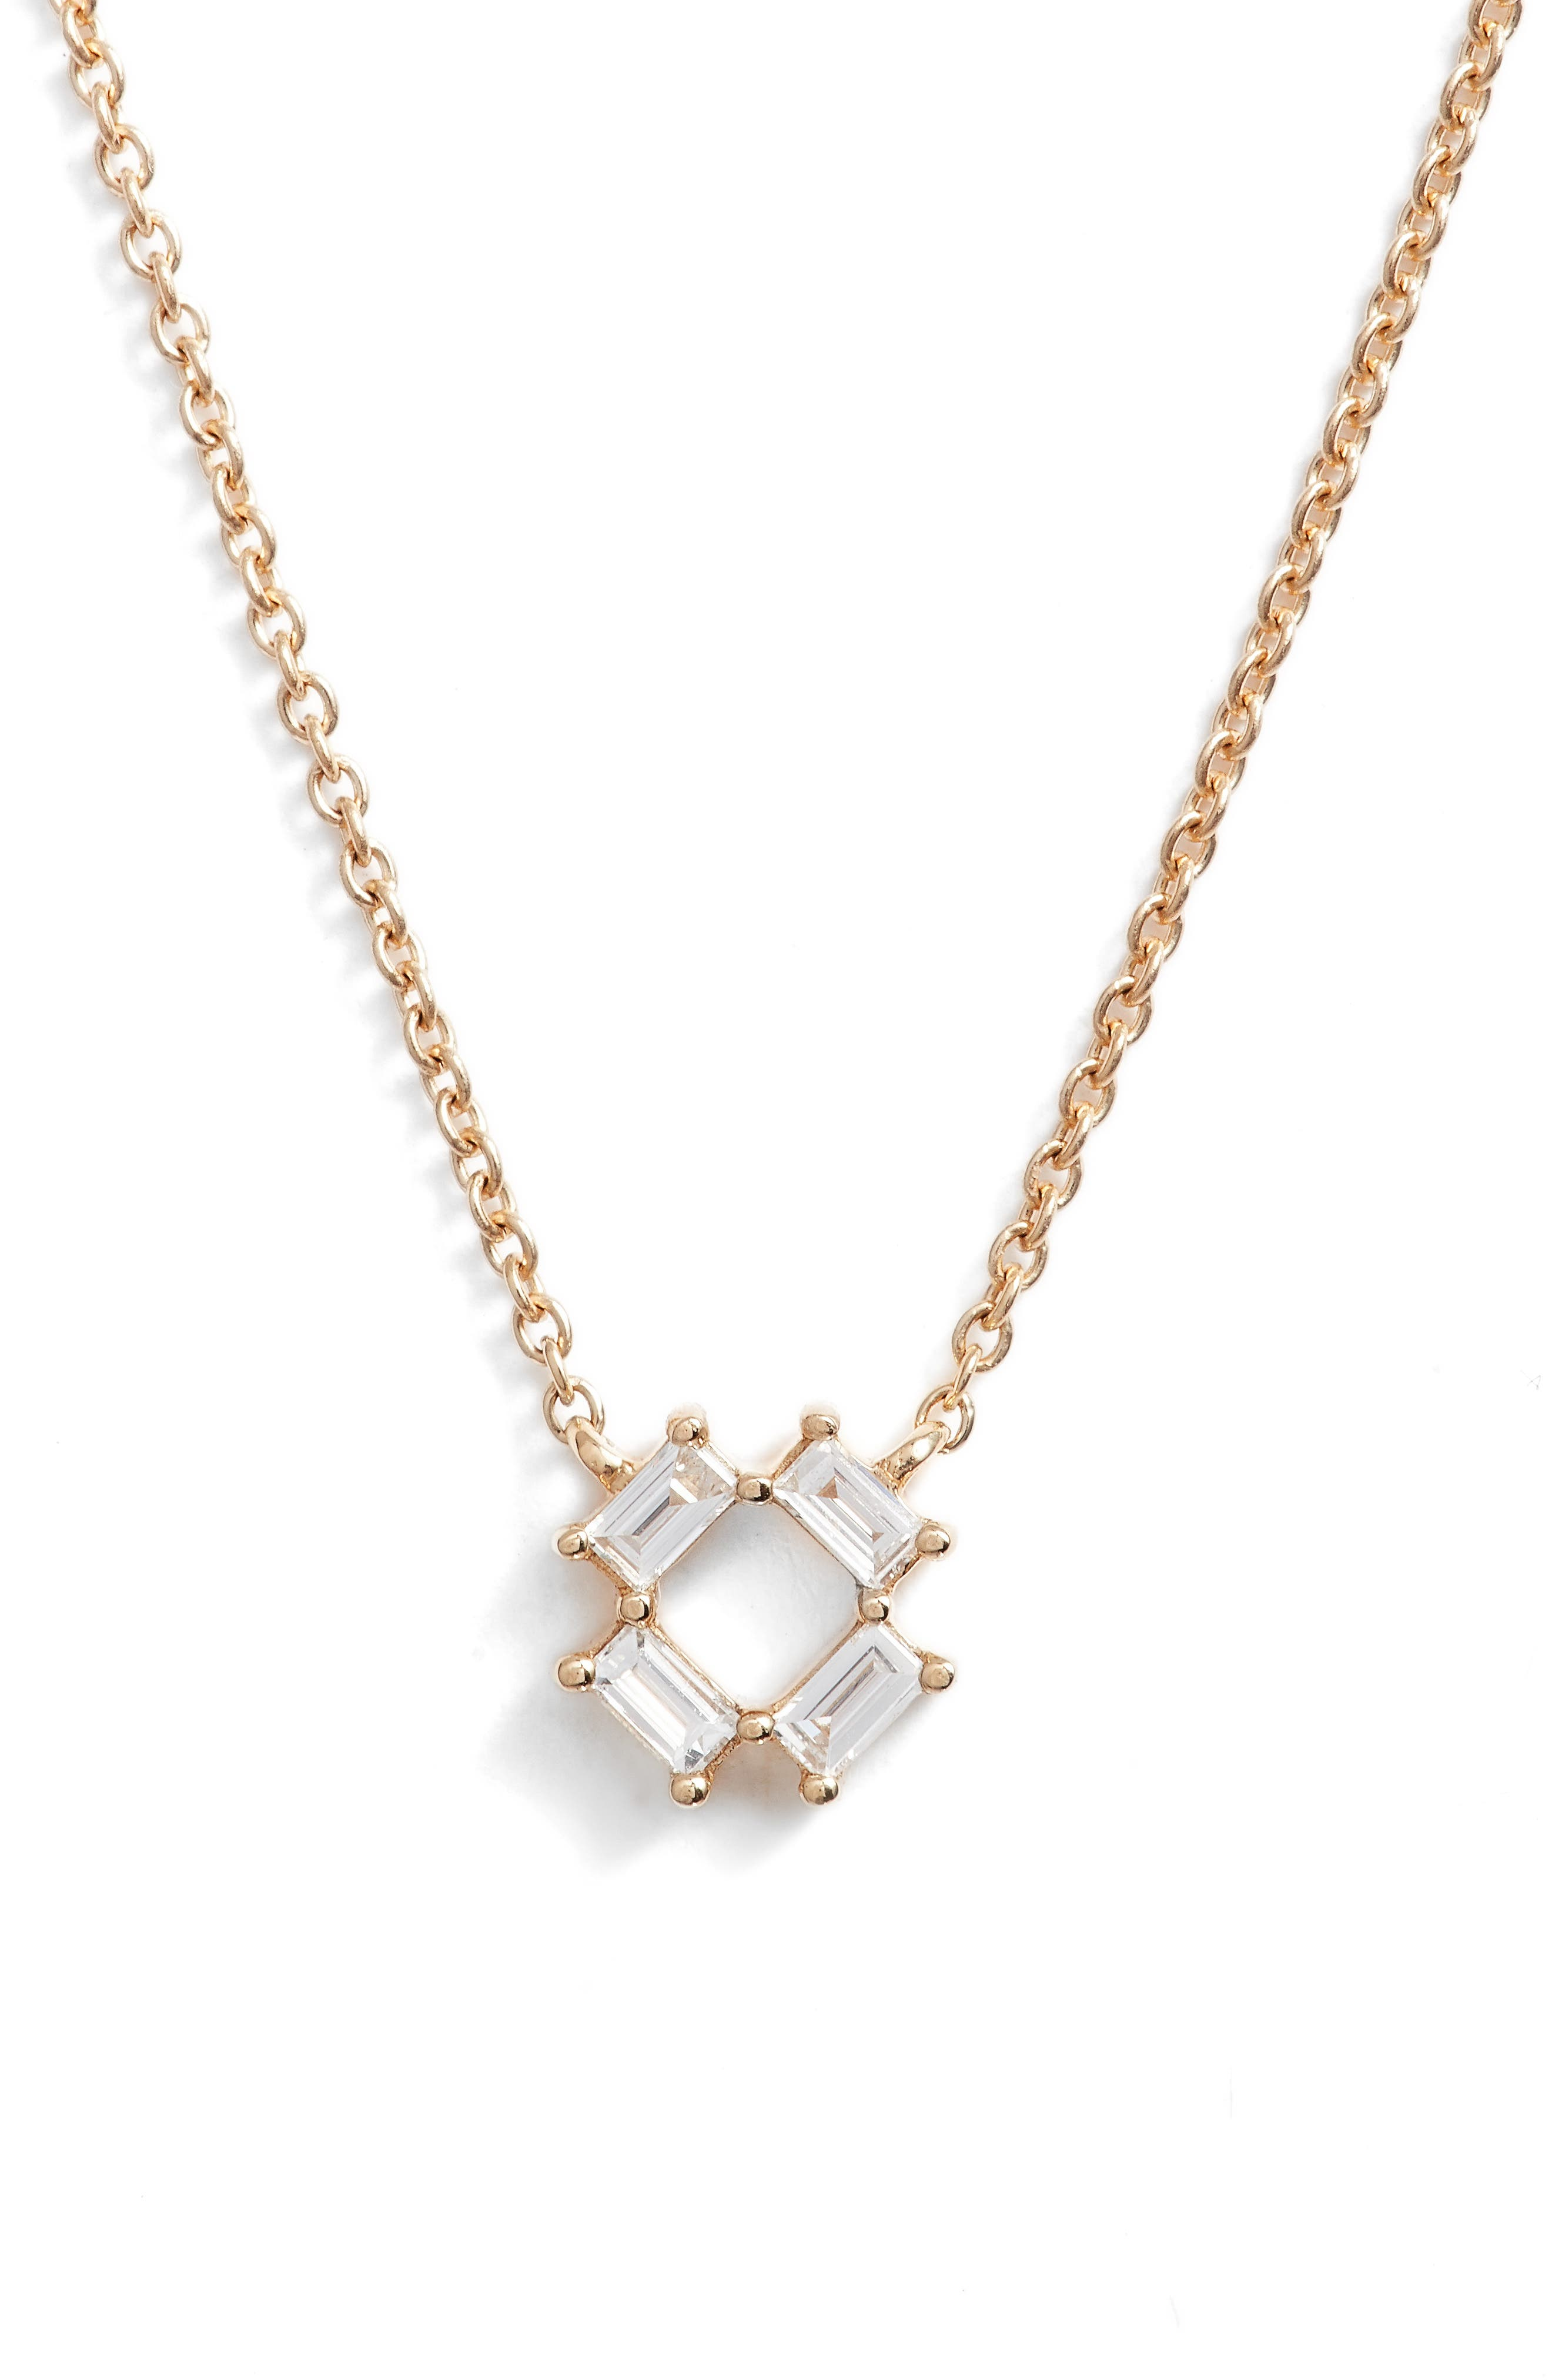 Sadie Diamond Pendant Necklace,                             Main thumbnail 1, color,                             YELLOW GOLD